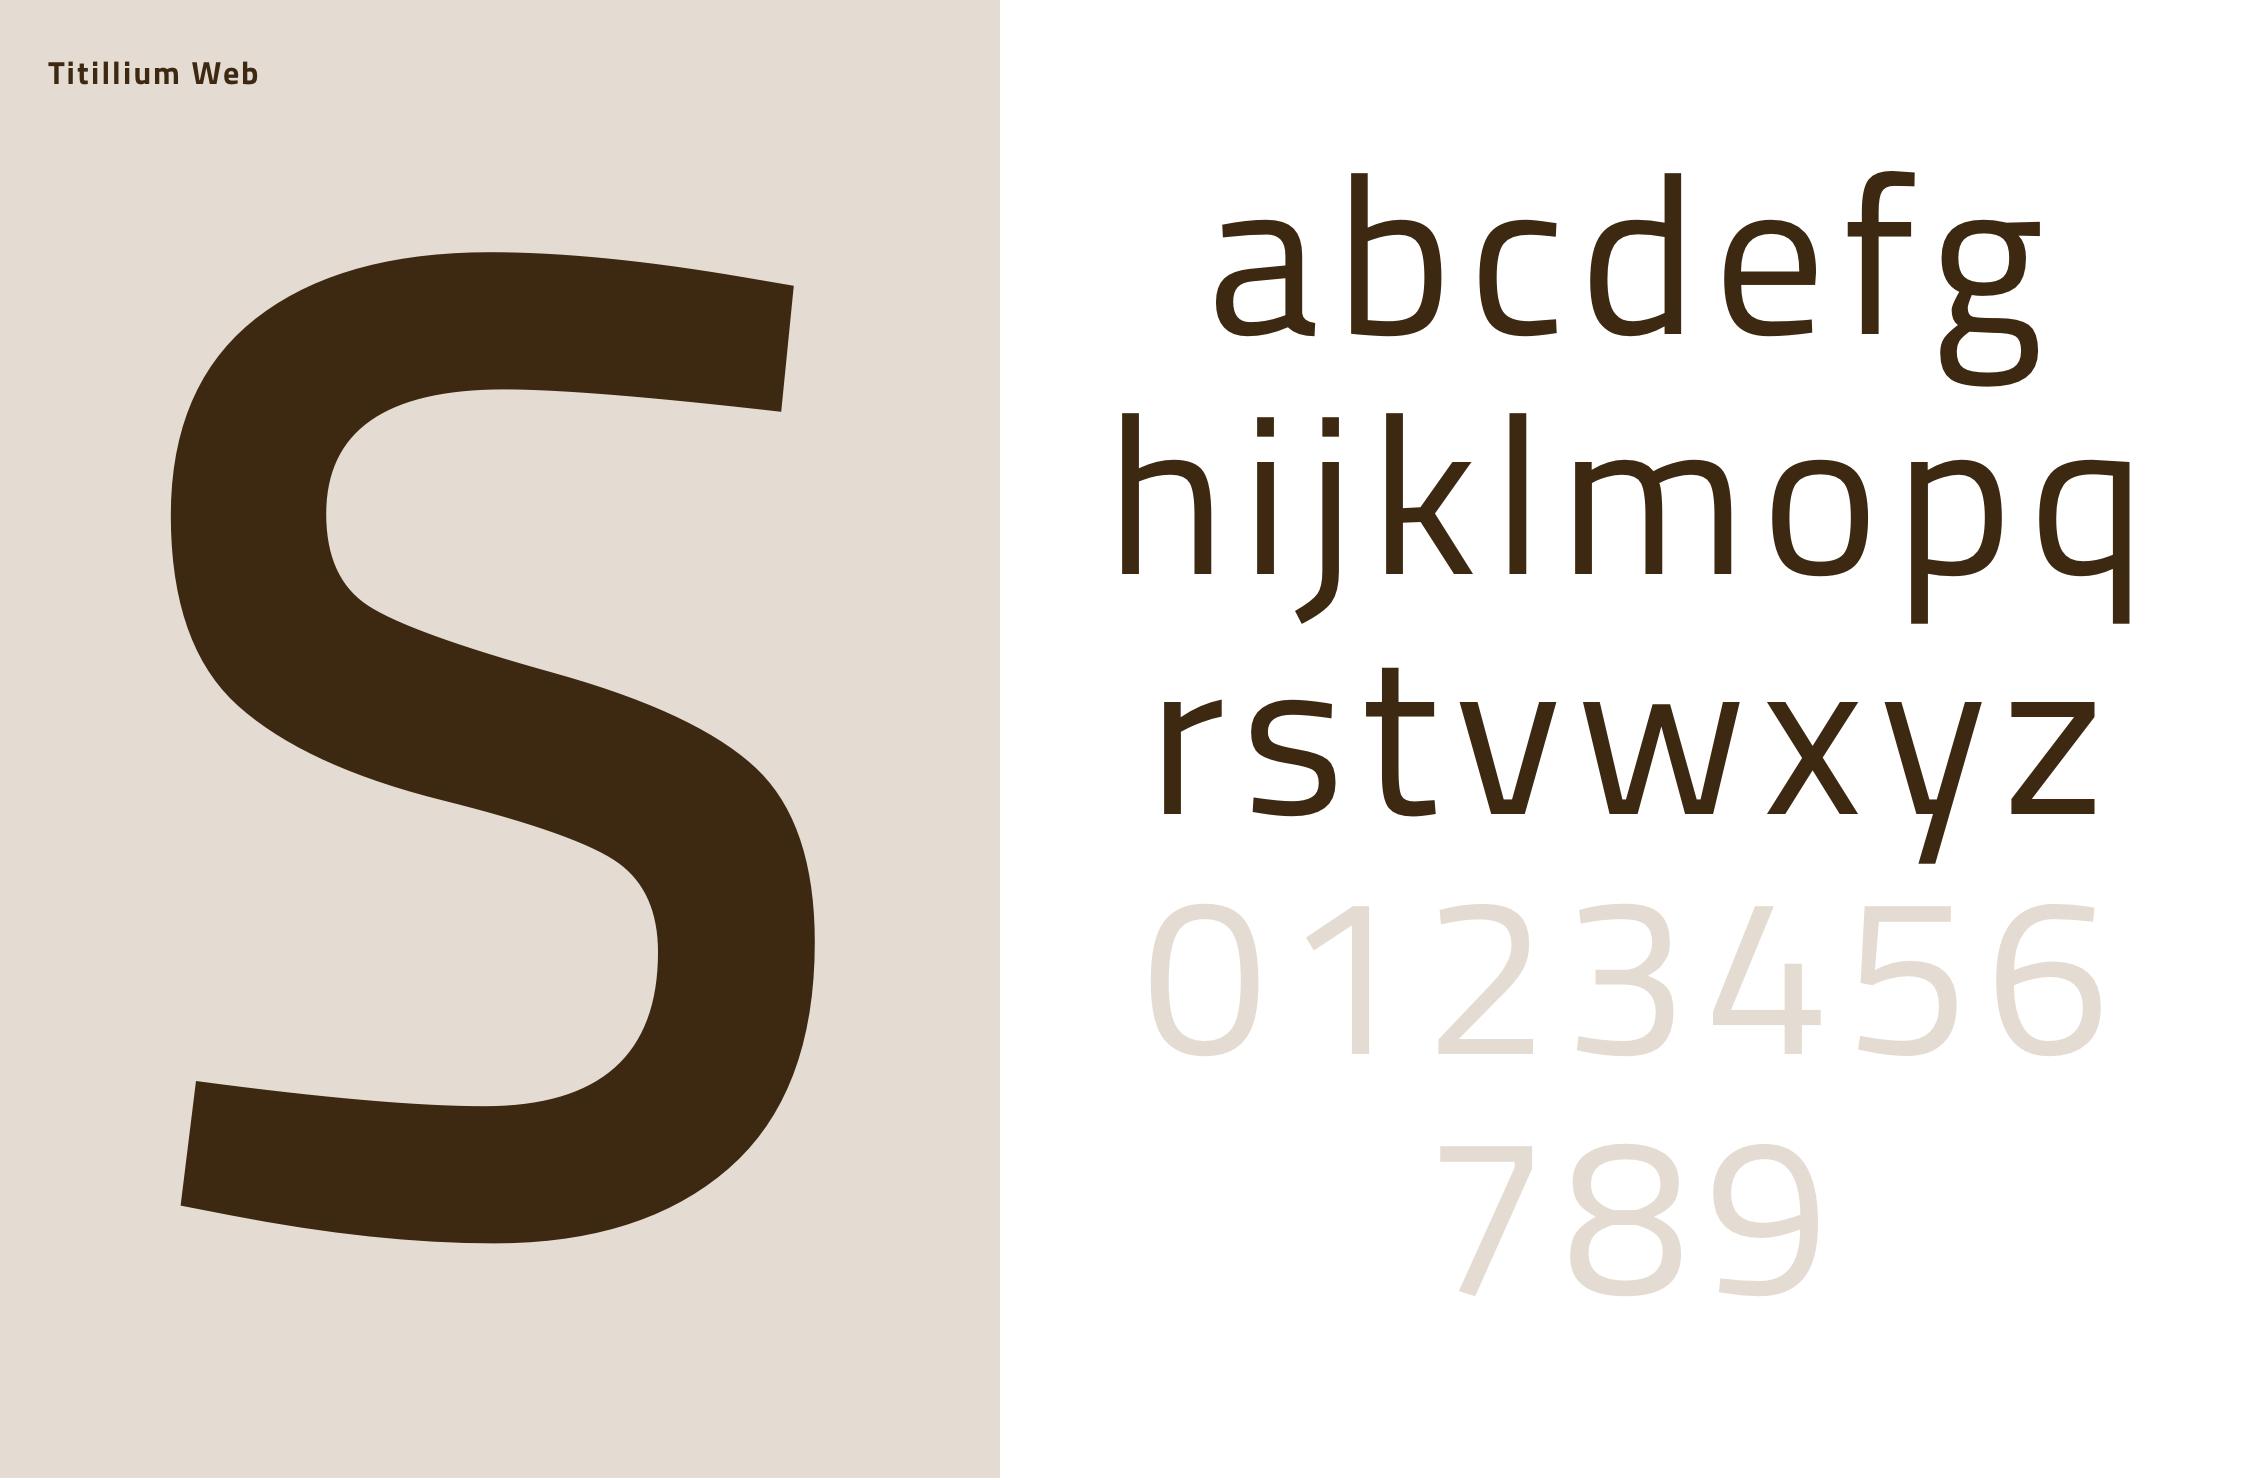 Studio della font per la piattaforma